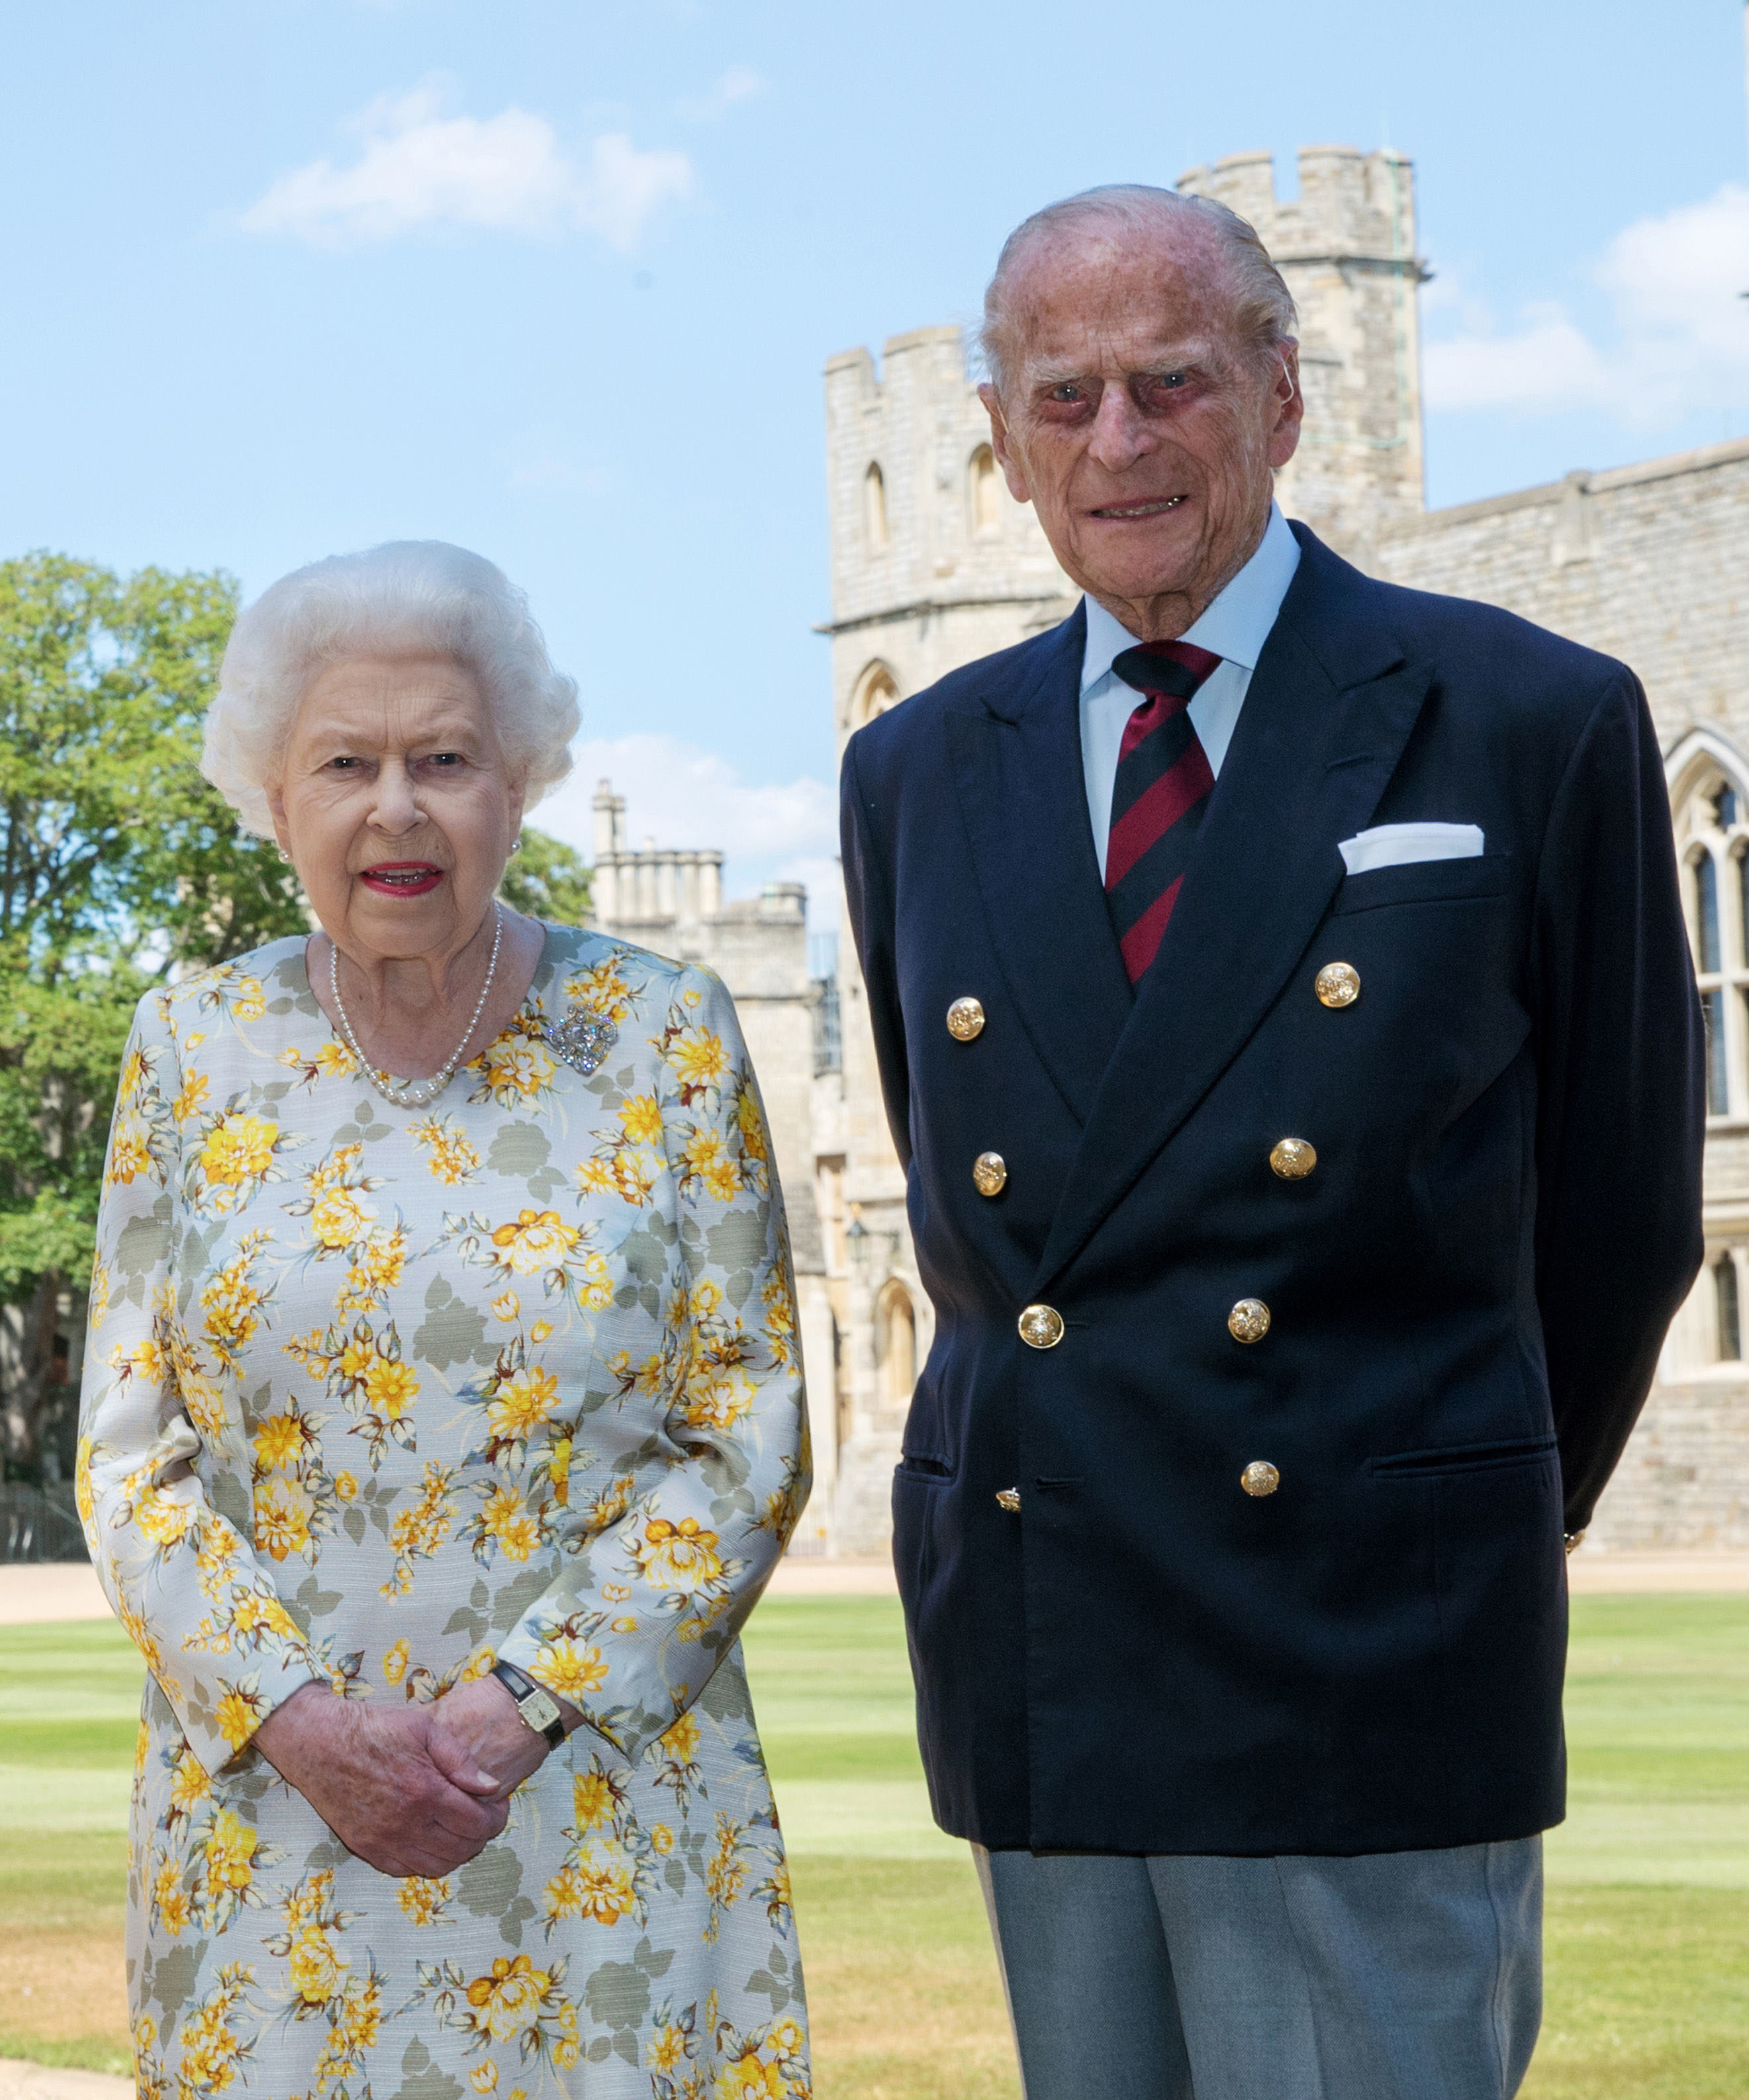 Kraljica Elizabeta II i vojvoda od Edinburga